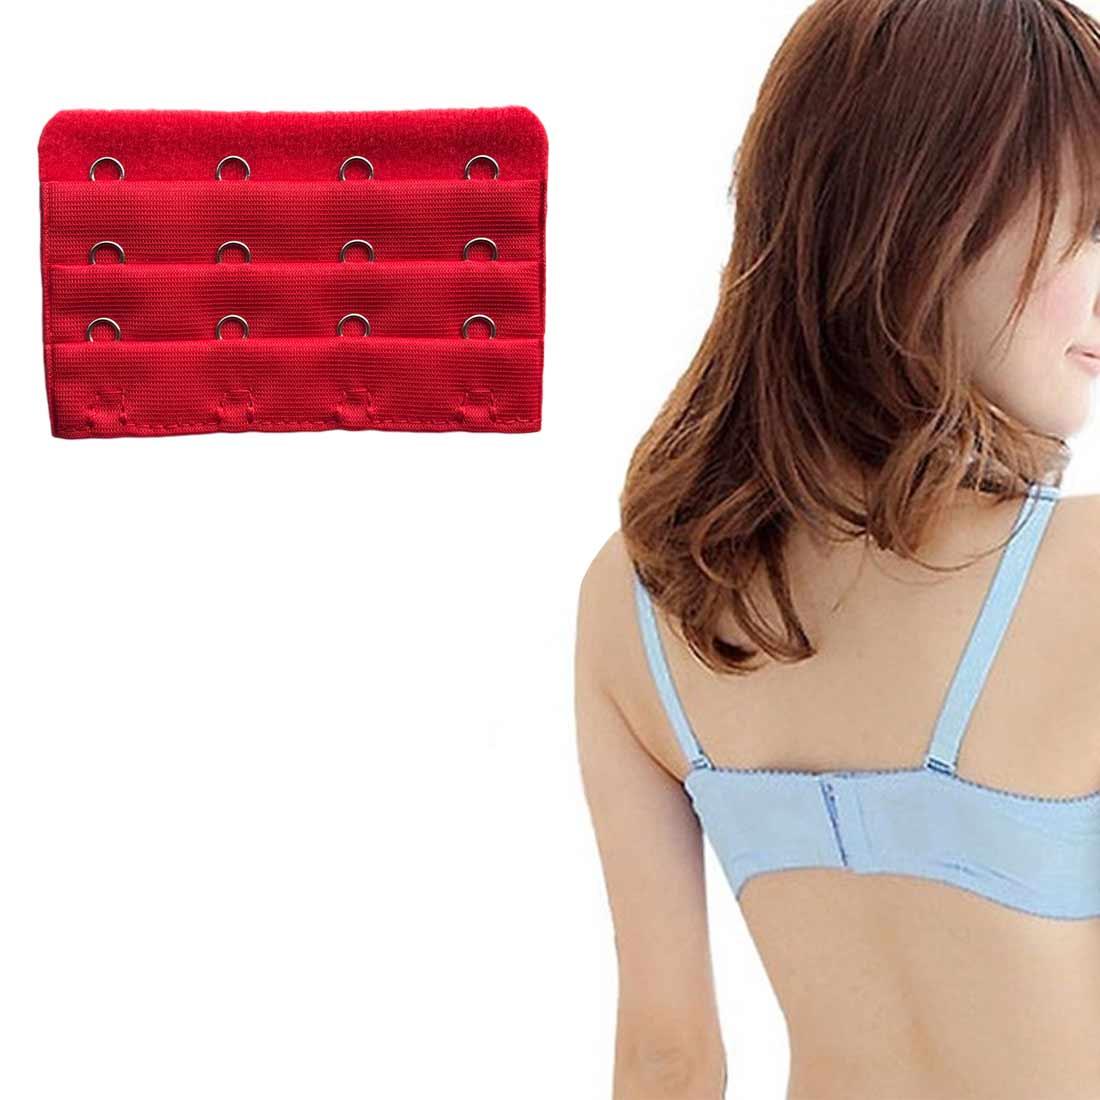 Bra Extender Clip Strap Extension Clasp Straps Women Bra Strap Extender Sewing Tool Adjustable Buckle Belt